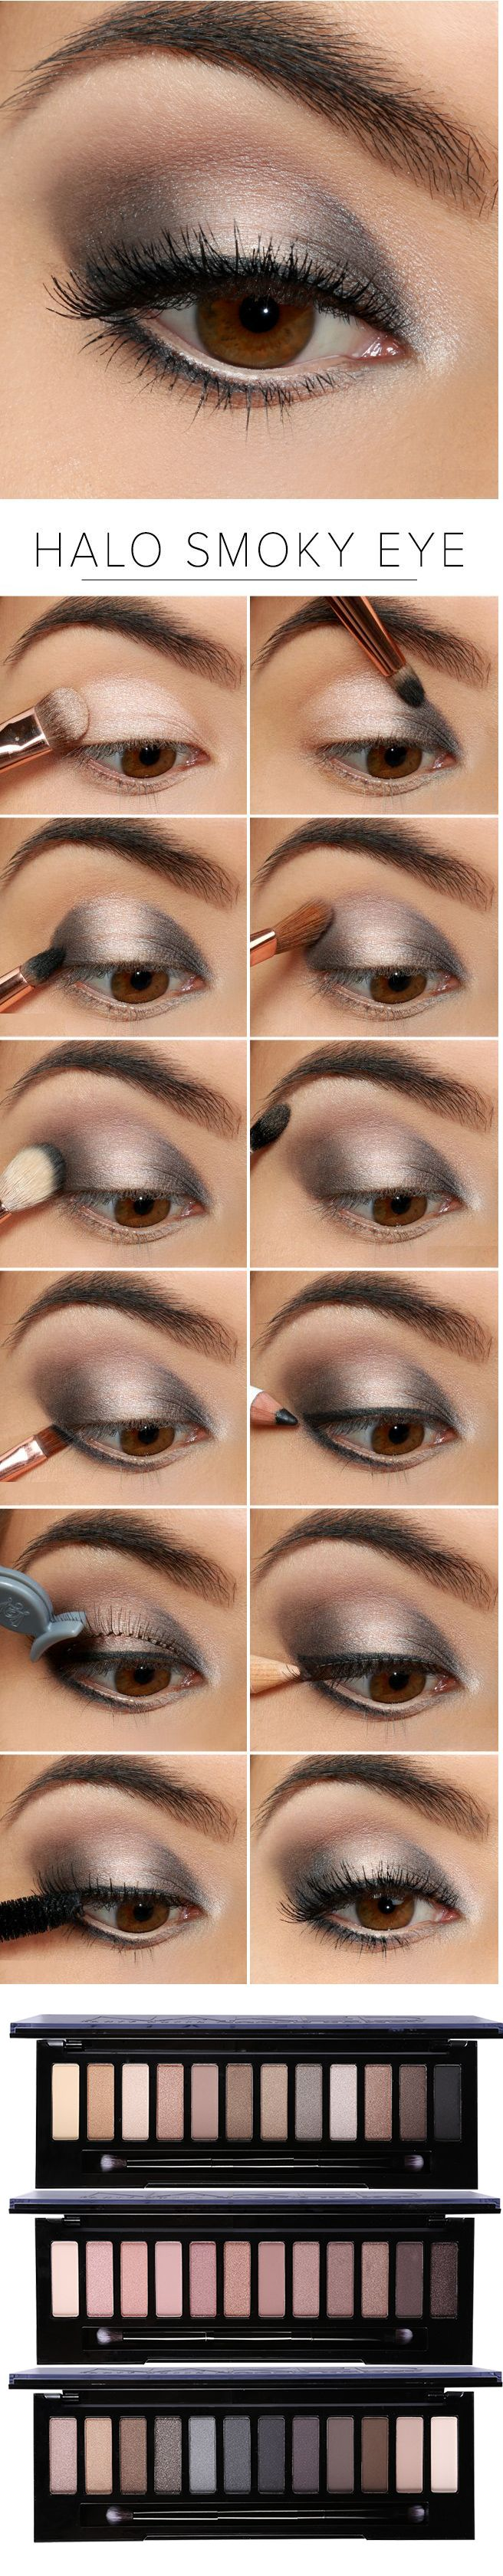 Step up your smokey eye game with our Halo Smokey Eye Shadow Tutorial!